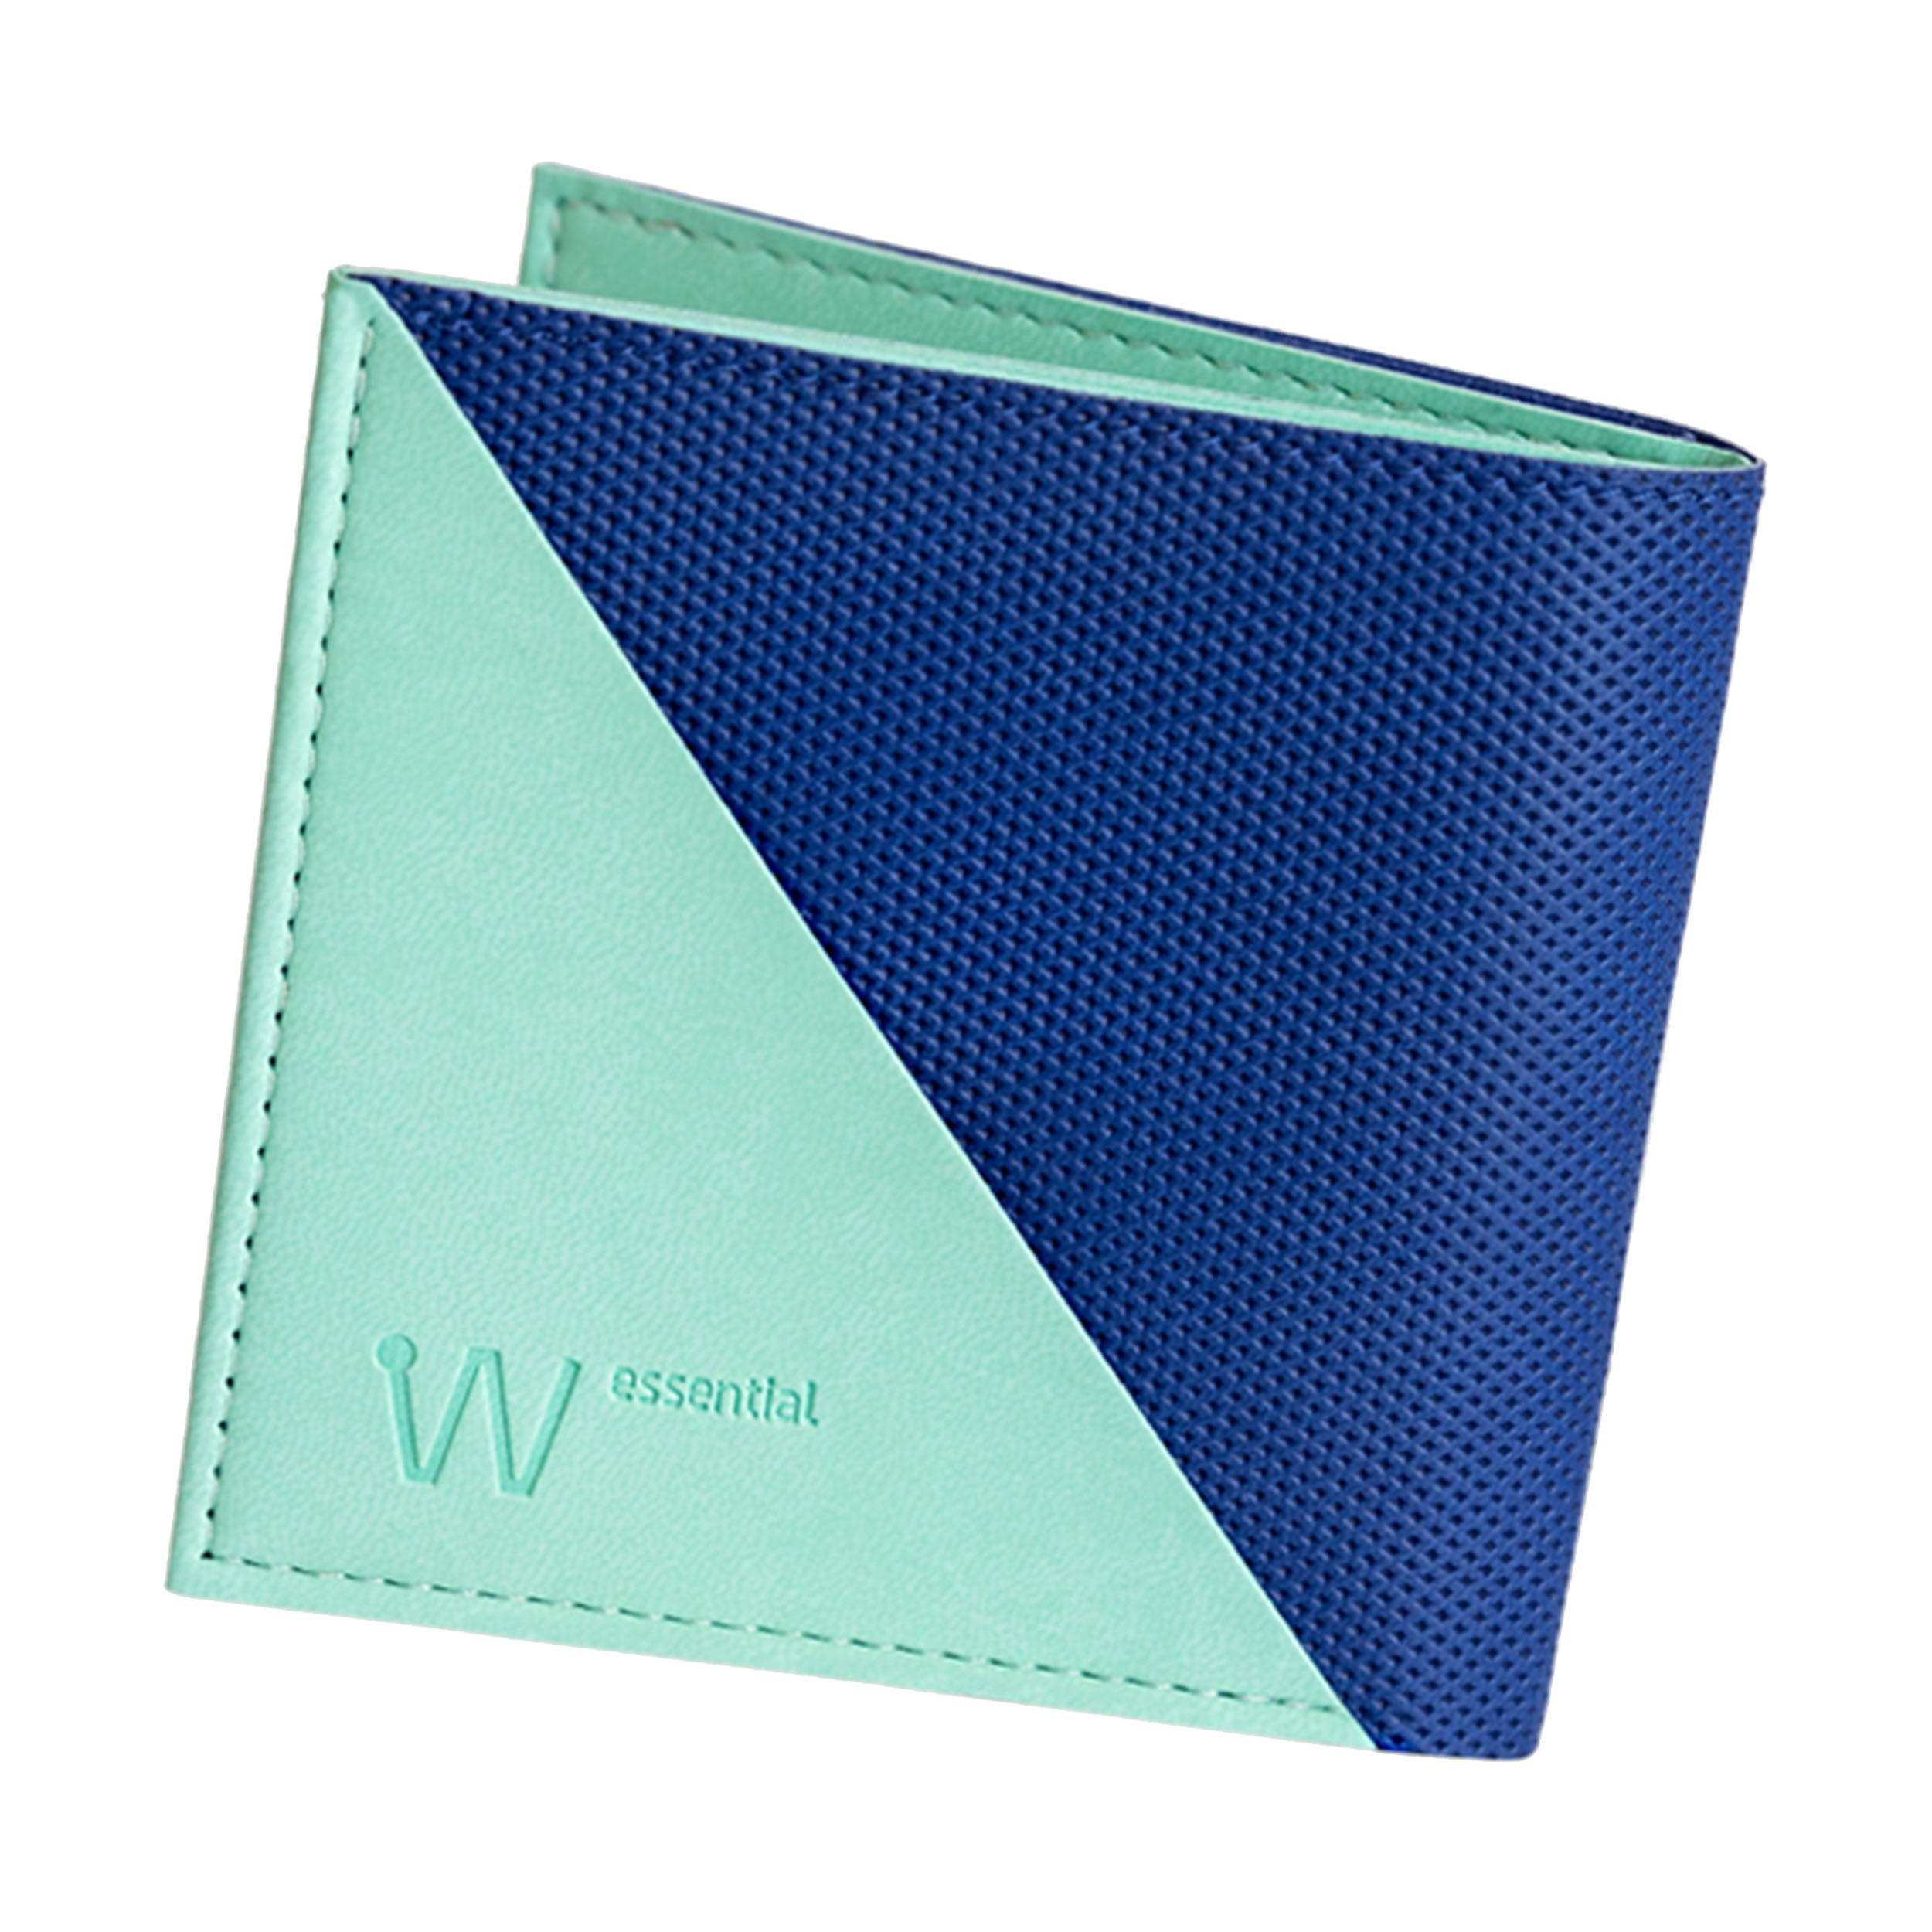 Baggizmo Wiseward Brieftasche